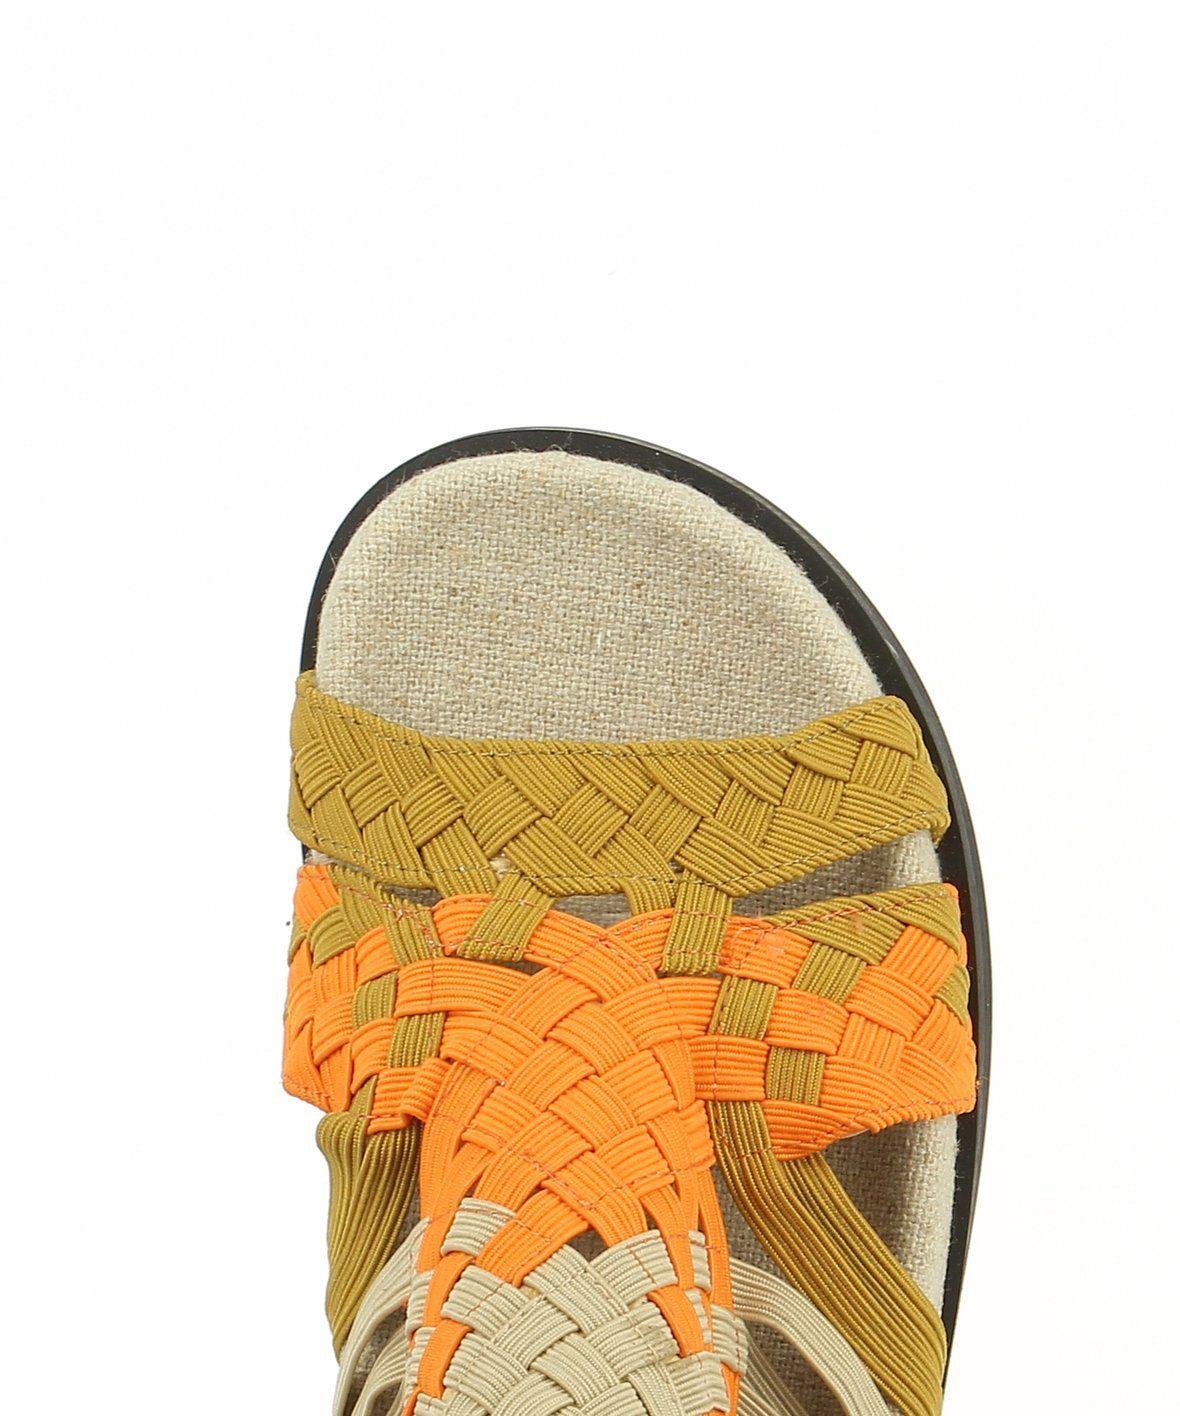 2 Baia Vista Velda Brown Multi Zomp Shoez Woven Ankle Strap Sandals